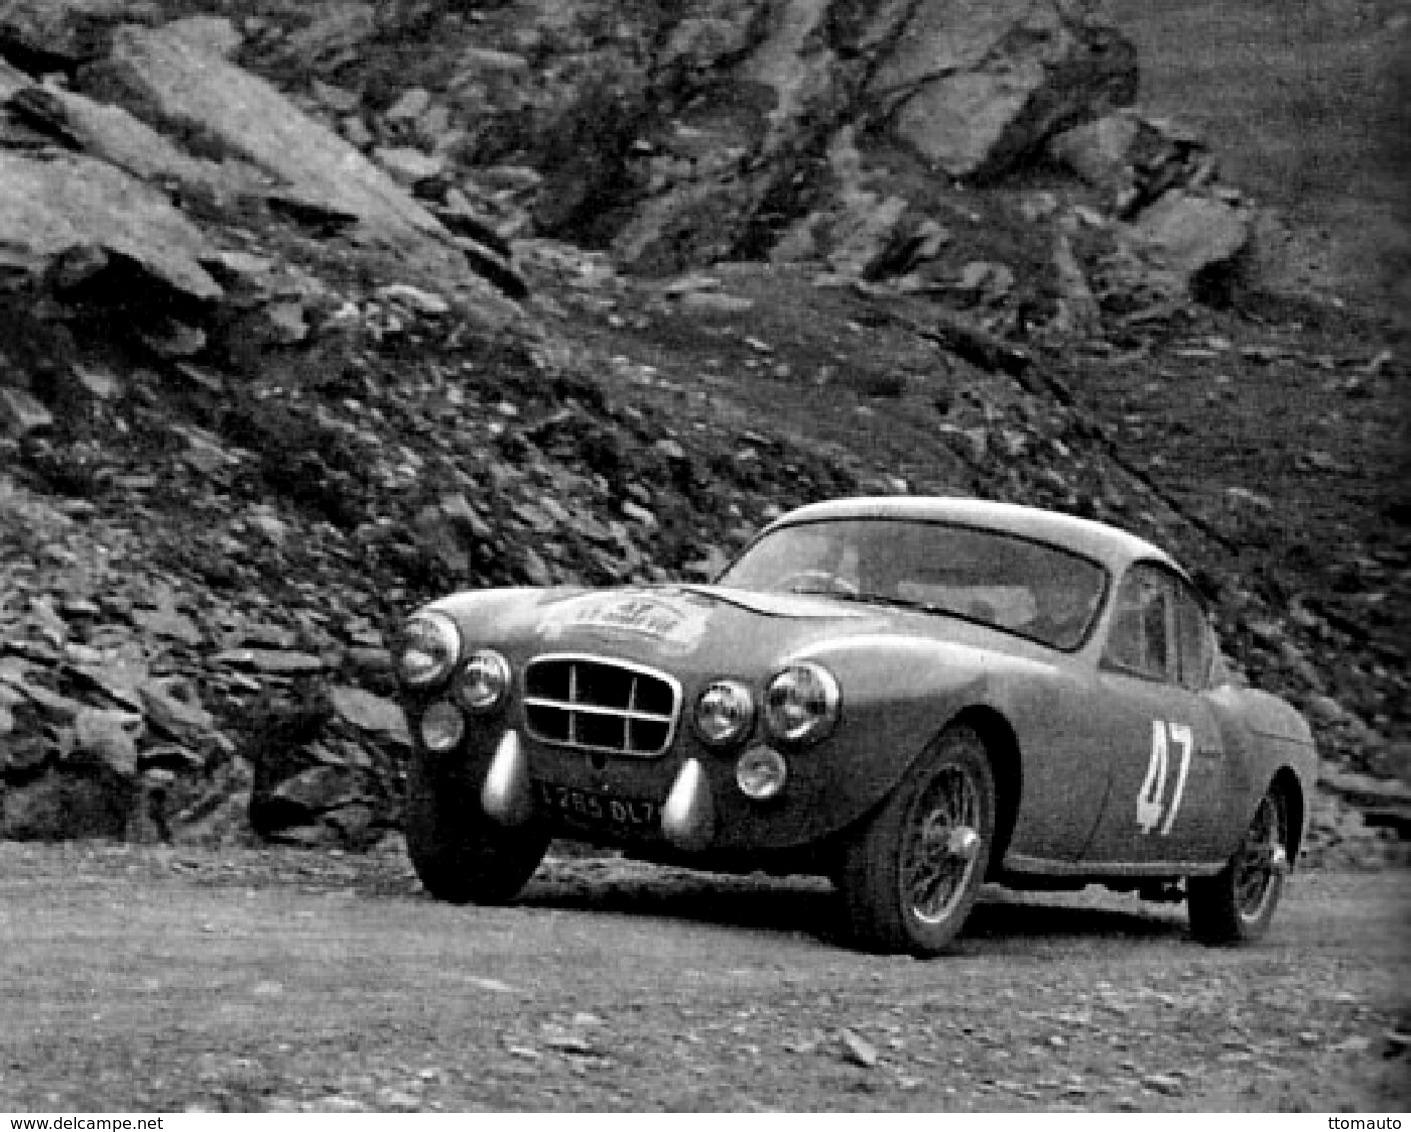 Liège-Rome-Liège Rally 1953  -  Salmson 2300S  -  Pilote: Jean Lemerle  -  15x10cms PHOTO - Rallyes